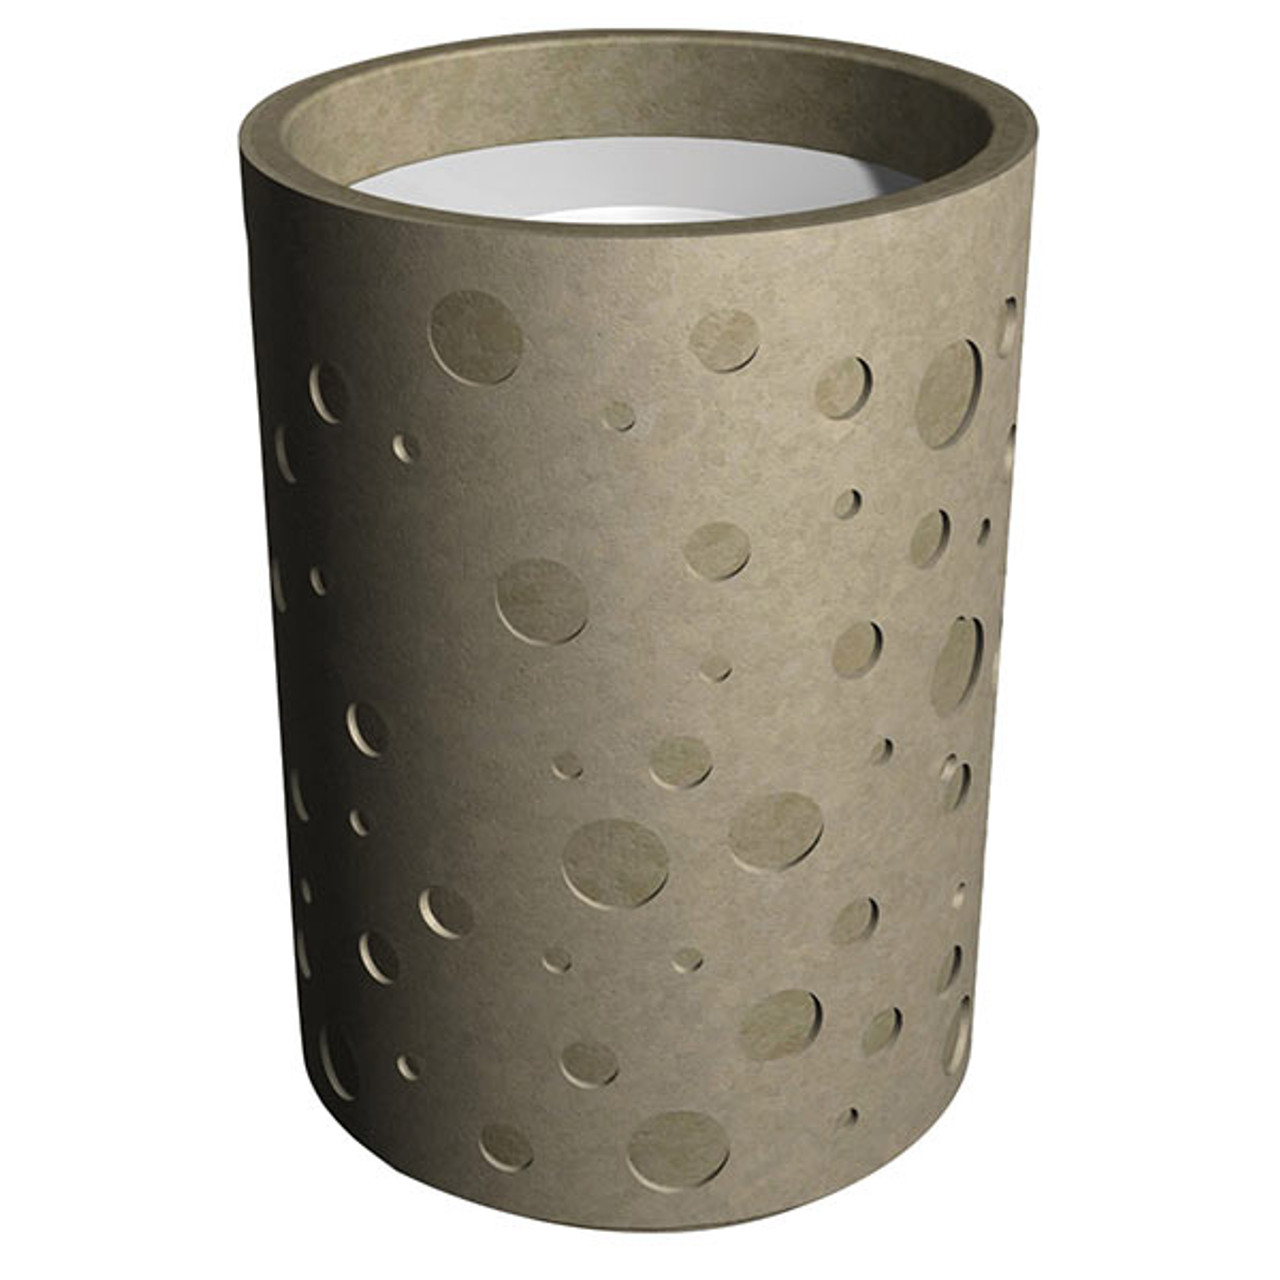 31 Gallon Decorative Concrete Outdoor Trash Receptacle WS100